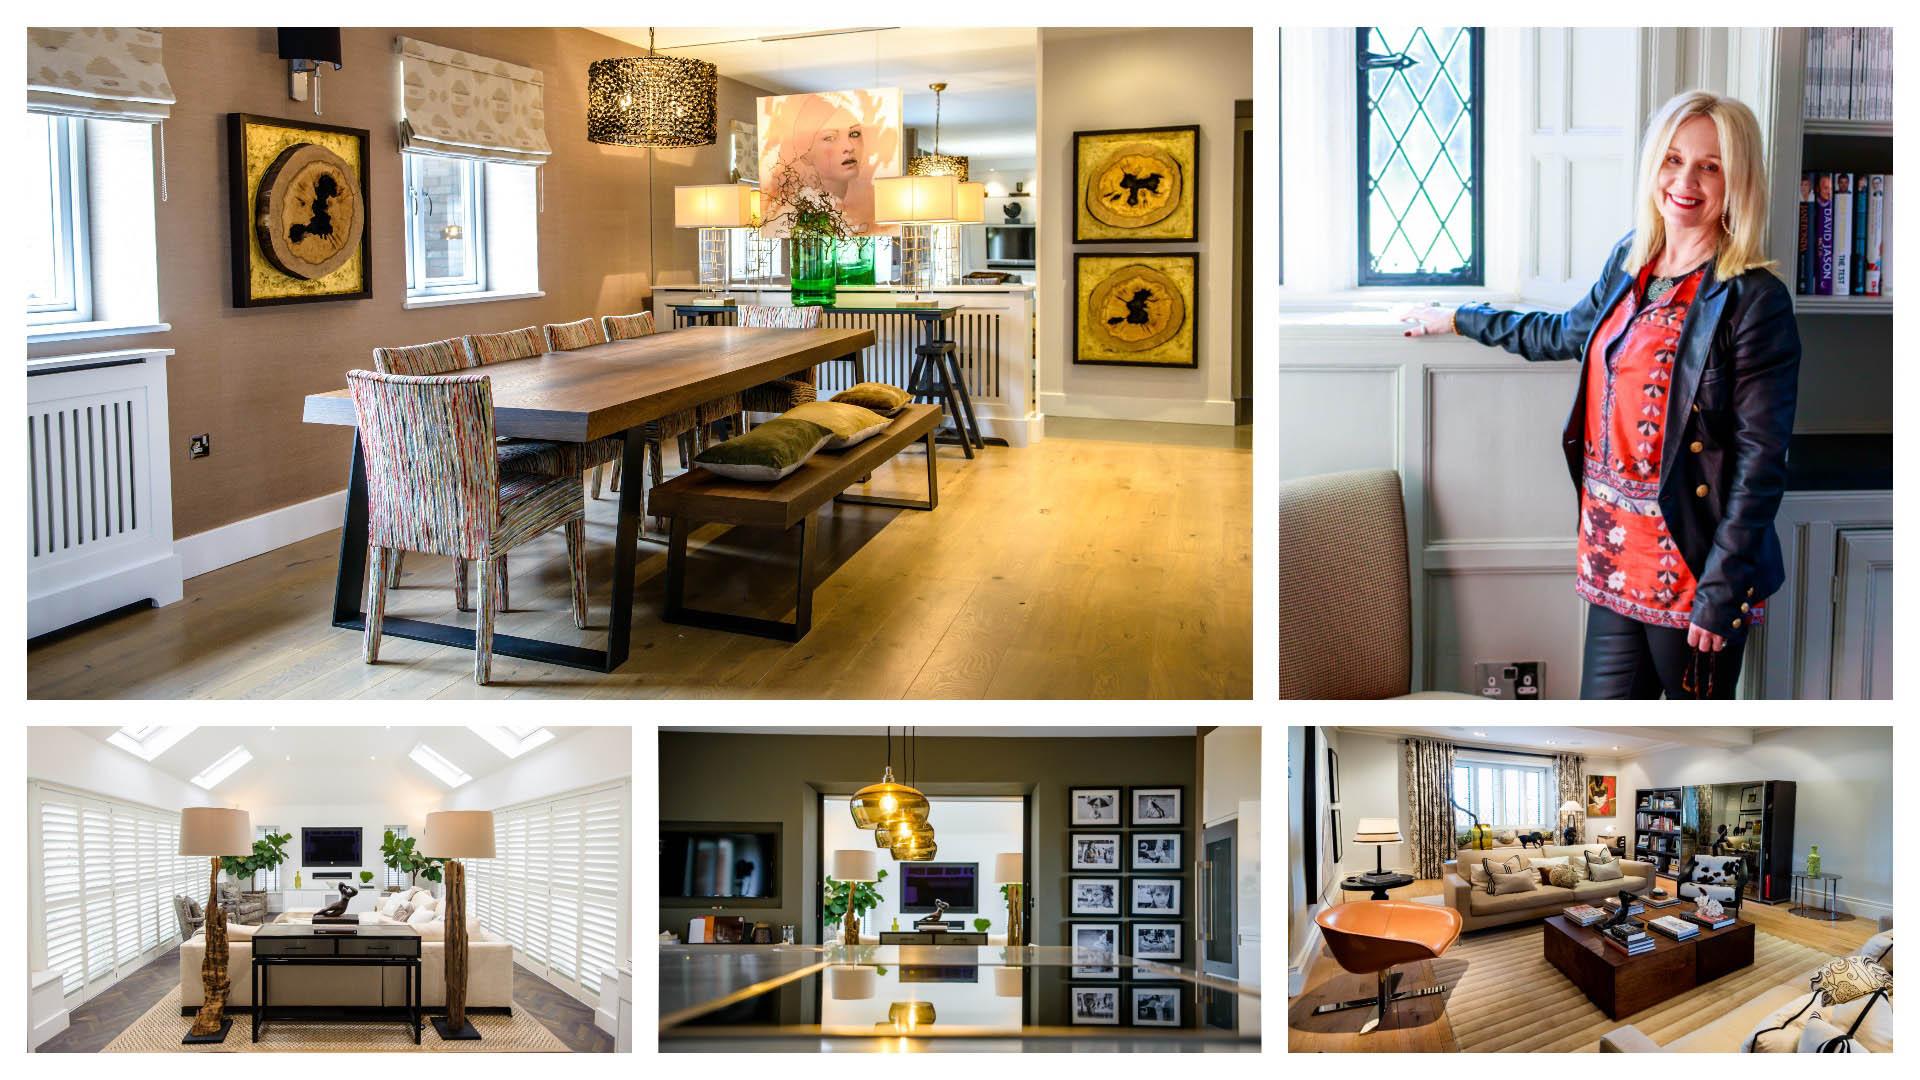 warwickshire-gloucestershire-cotswod-casements-interior-design-photography-su-satchwell